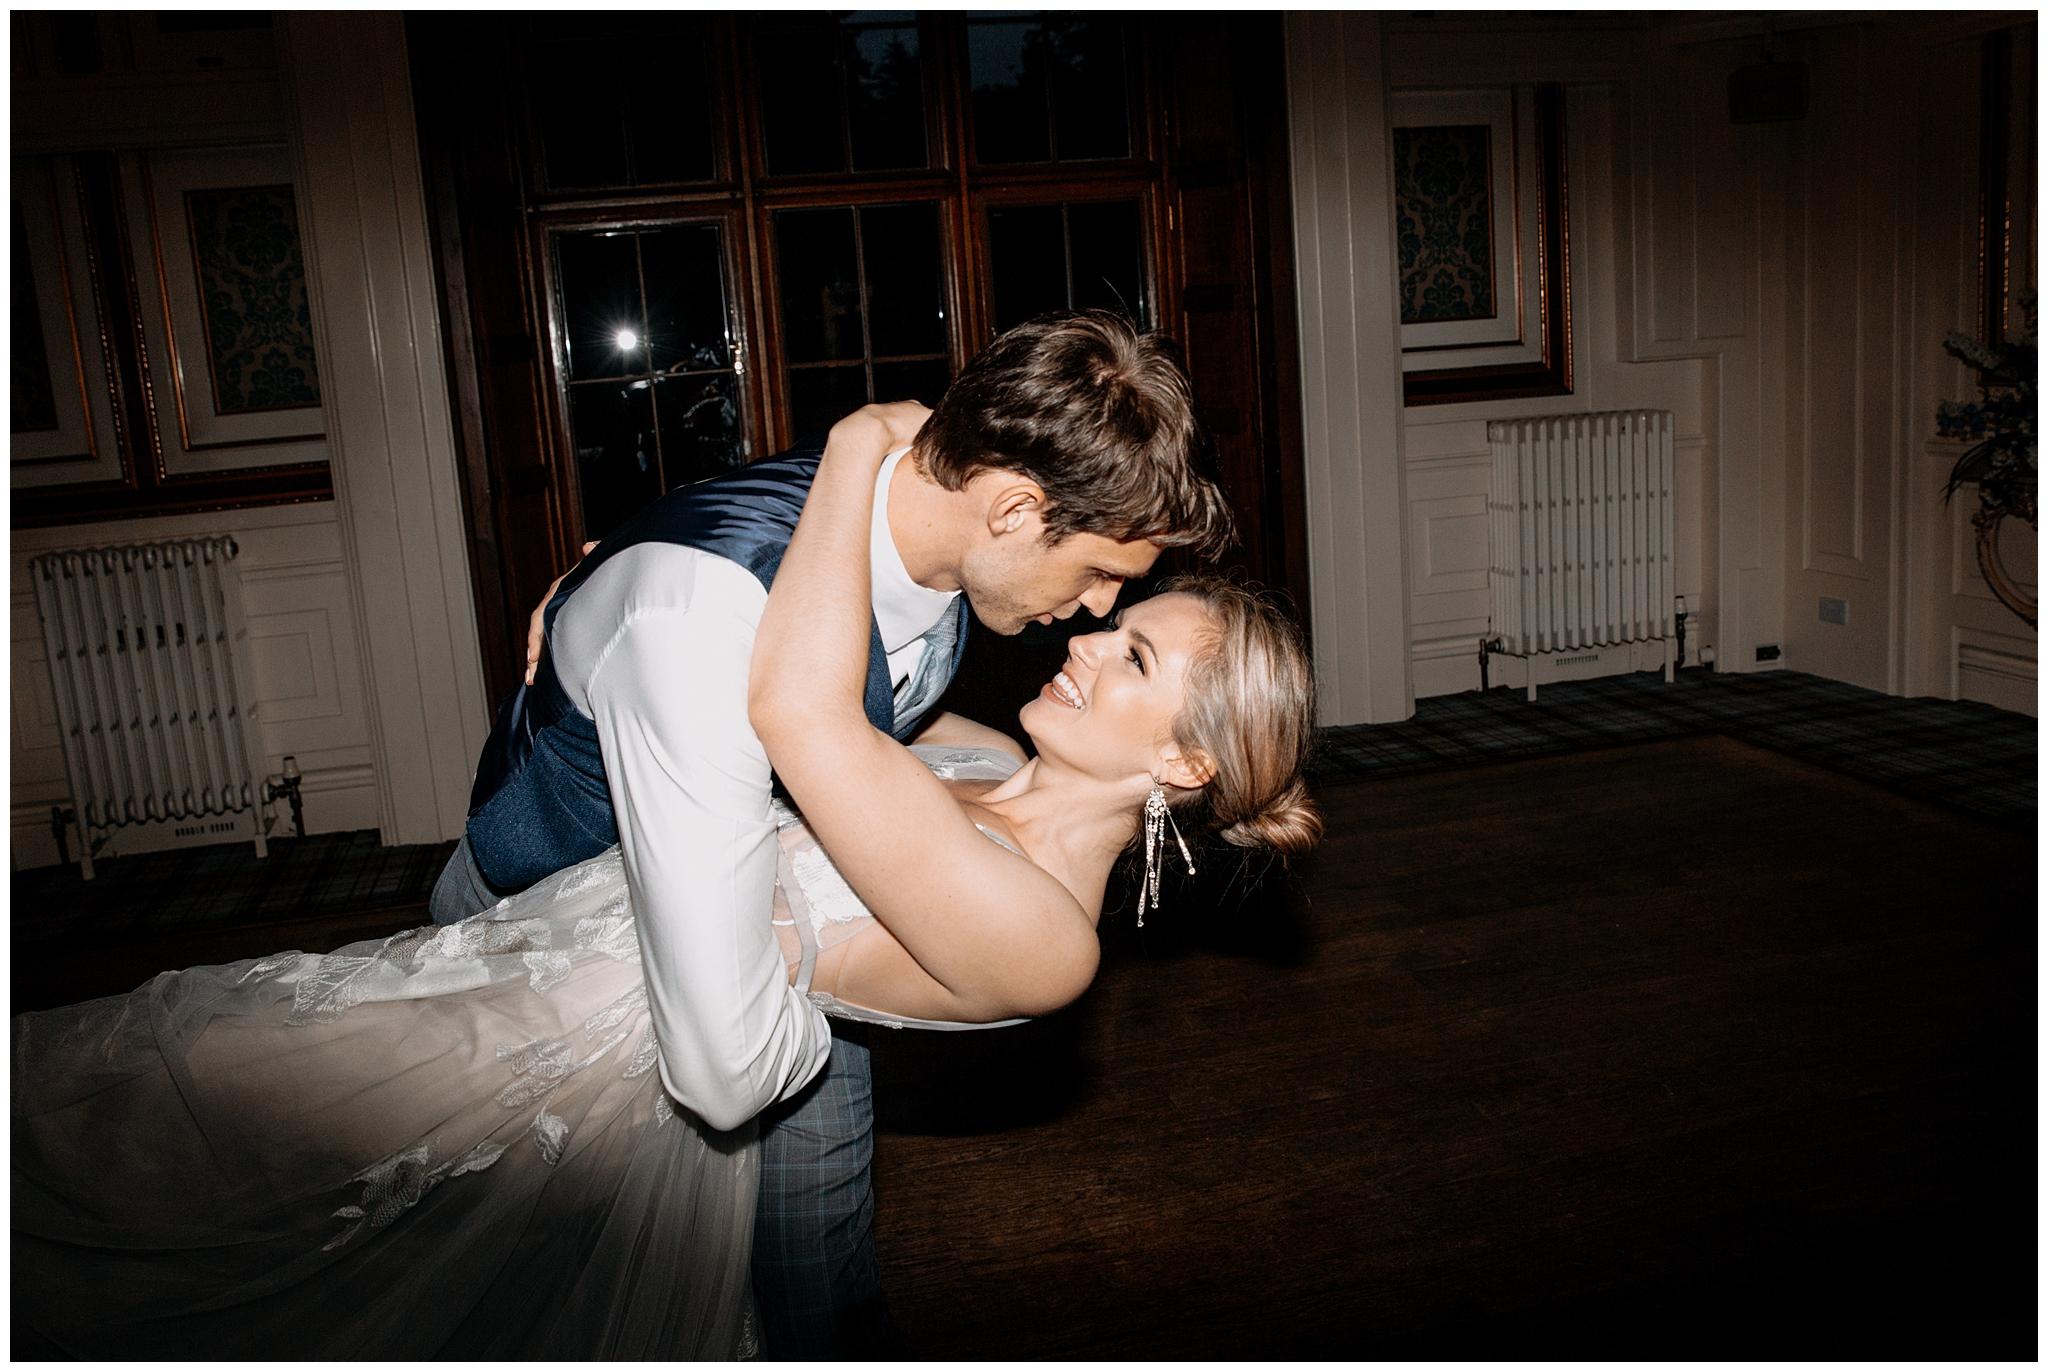 austin-texas-scottish-wedding-bride-groom22029.JPG